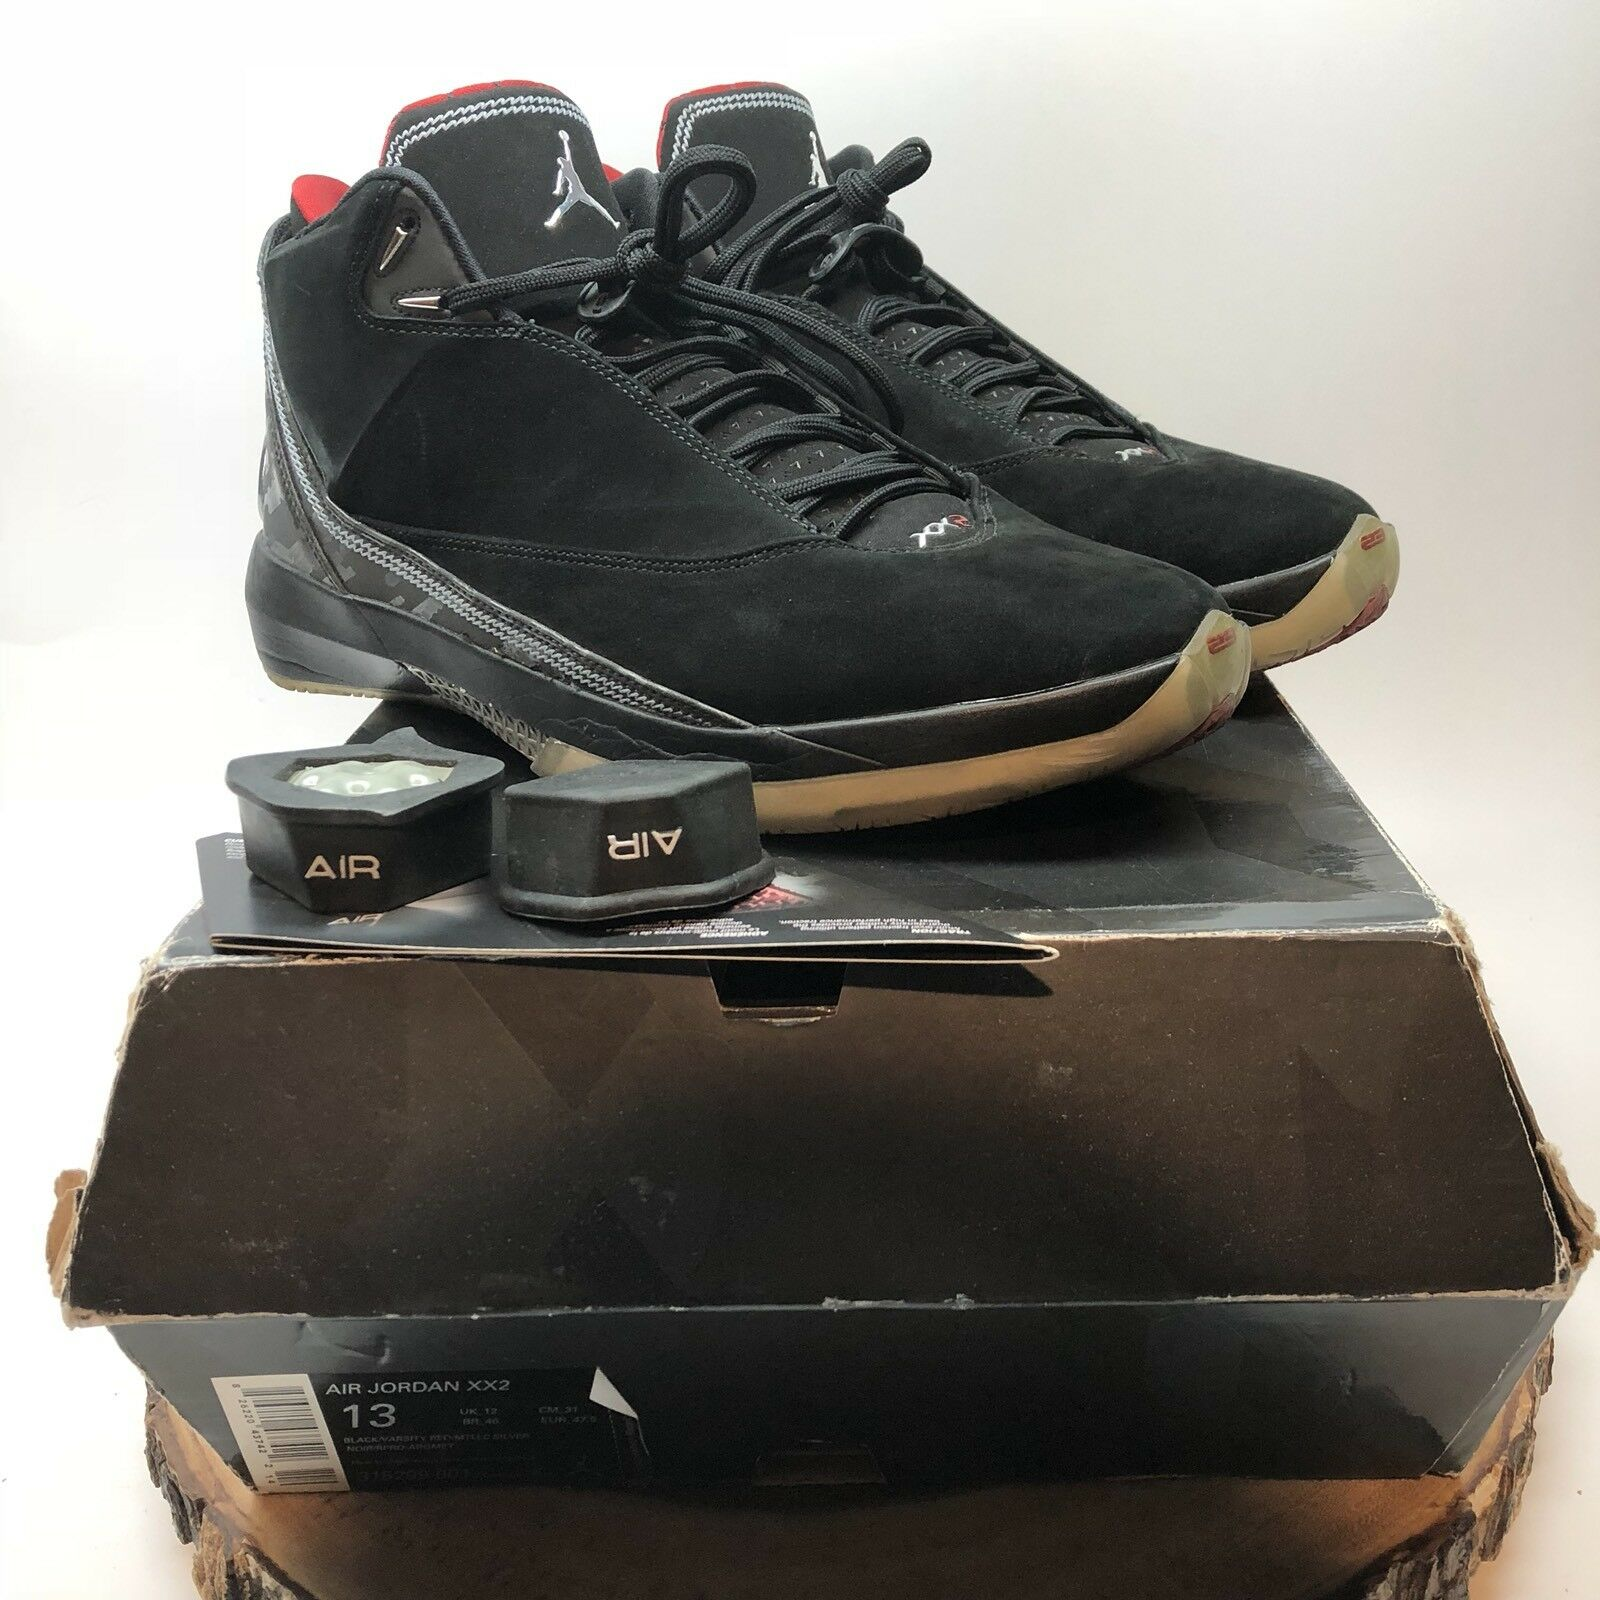 NIKE AIR JORDAN XX2 22 BLACK VARSITY RED METALLIC SILVER 315299-001 Price reduction Wild casual shoes